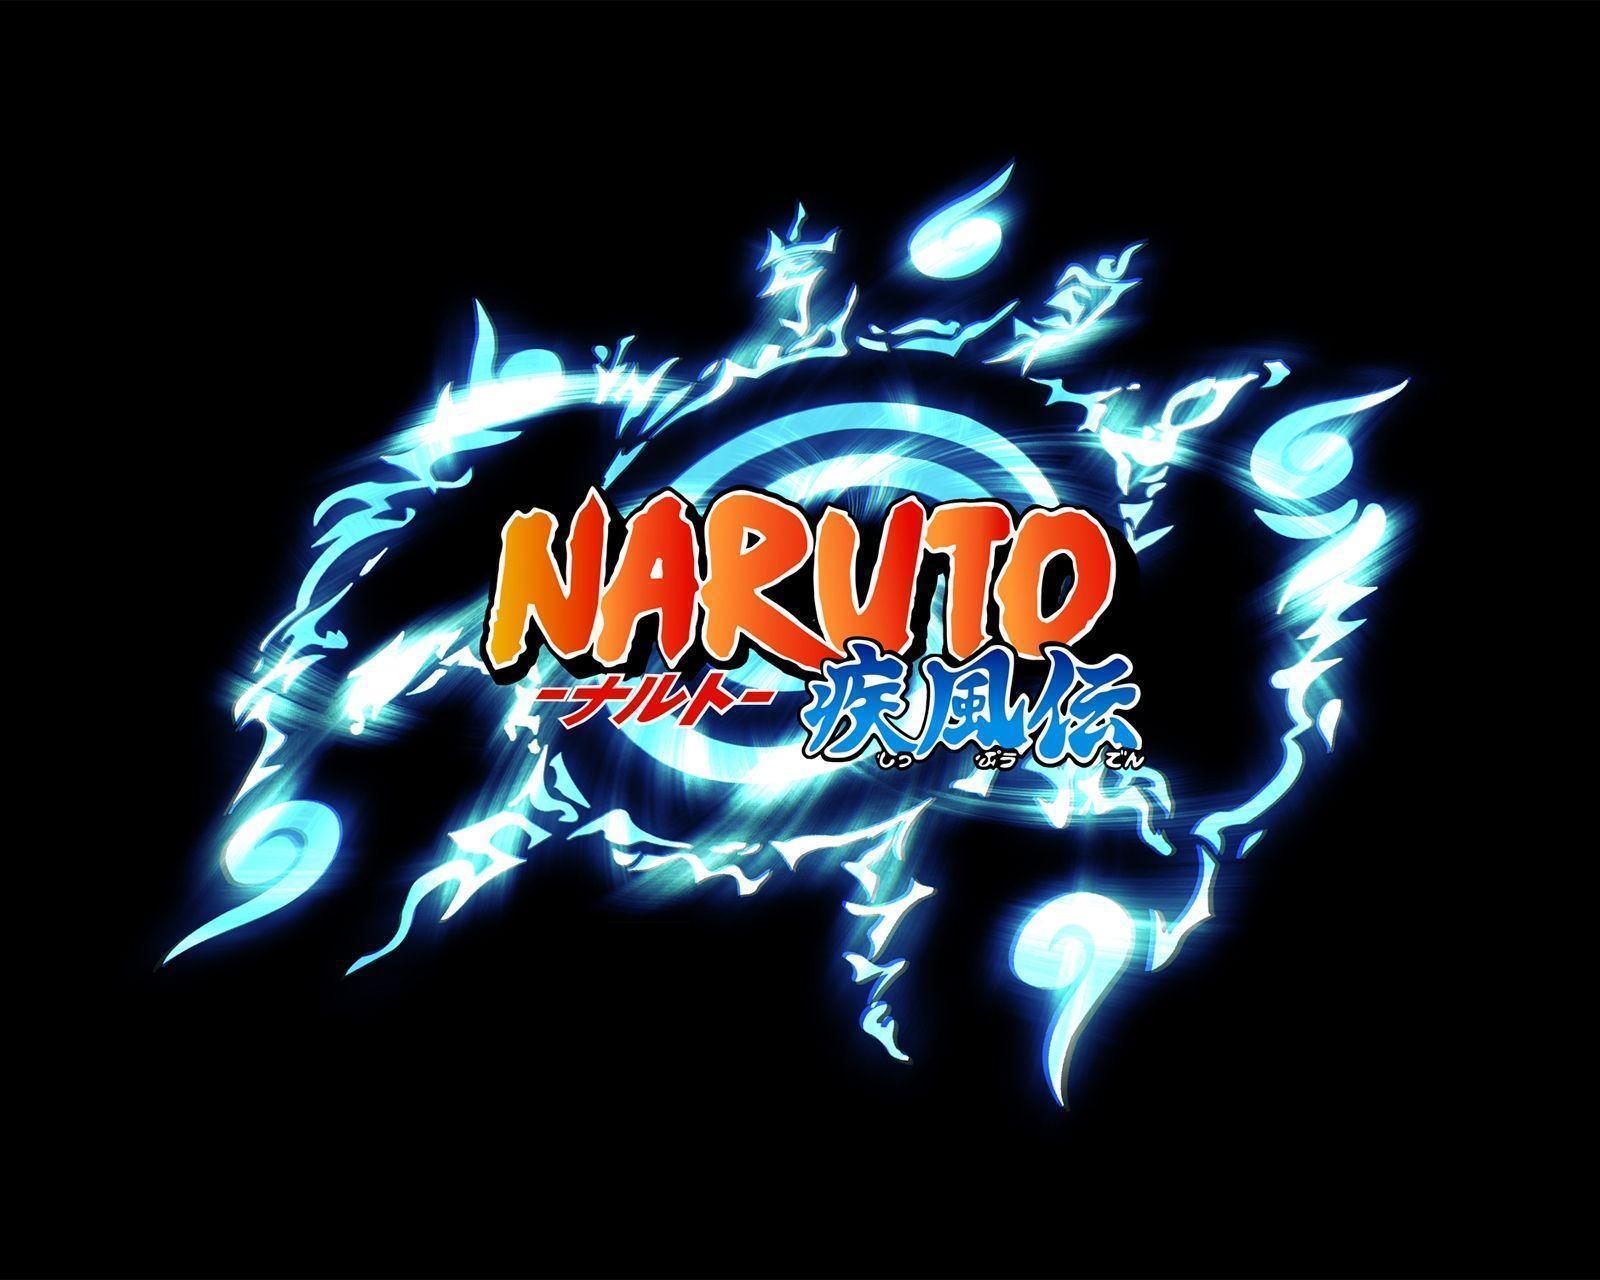 foto de Naruto Logo Wallpapers - Wallpaper Cave